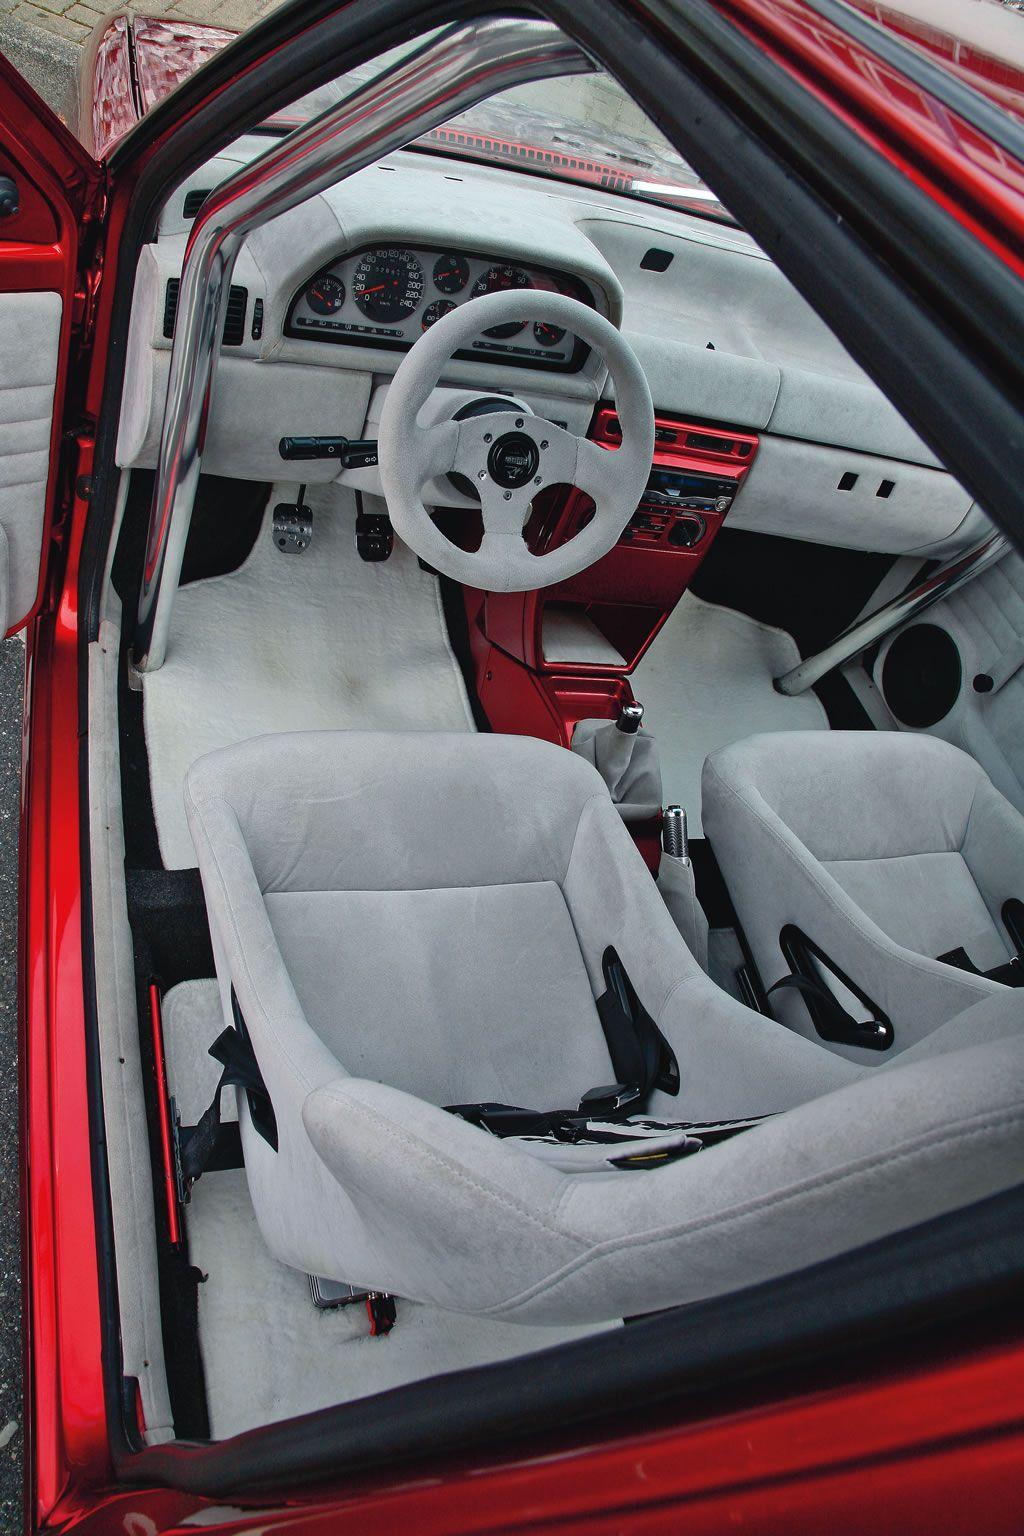 Fiat uno turbo 5eee0478a9e8078ba 0 0 0 0 0g 10241536 carro fiat uno turbo 5eee0478a9e8078ba 0 0 0 0 thecheapjerseys Image collections